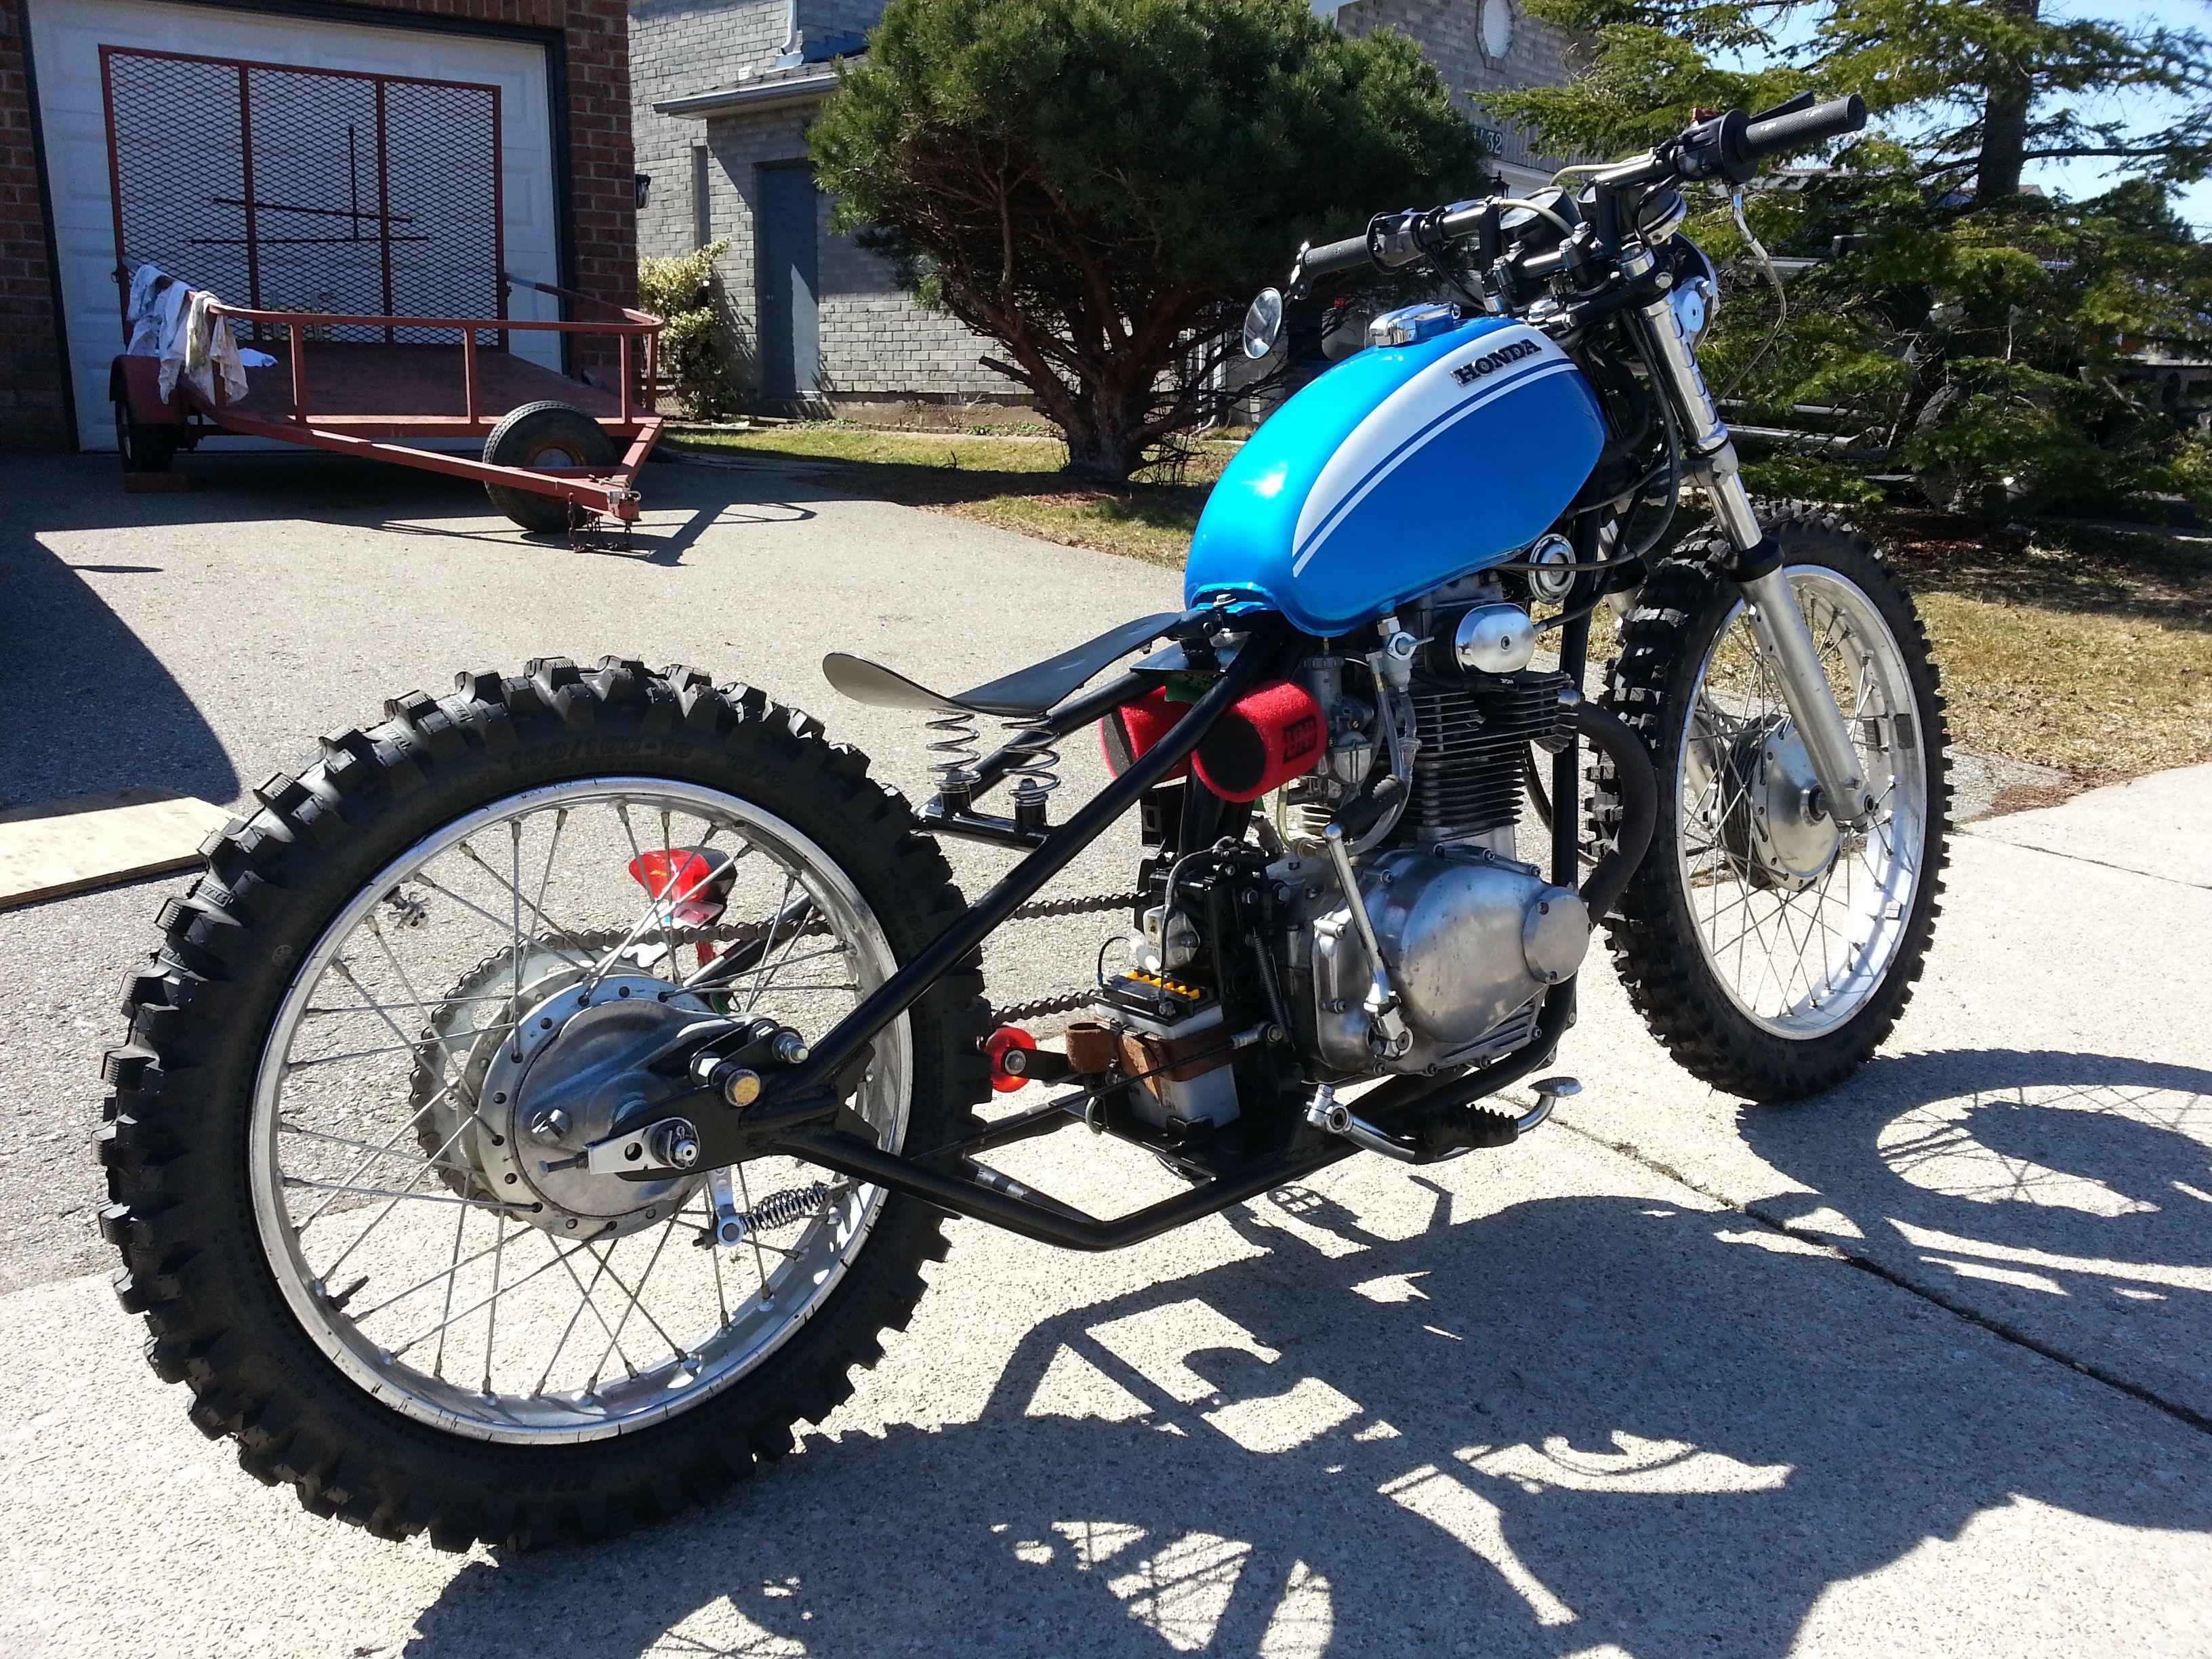 Xr600r My Dad Had One Now I Really Want One Follow Us To Http Racdaynews Com Honda Dirt Bike Enduro Motorcycle Honda